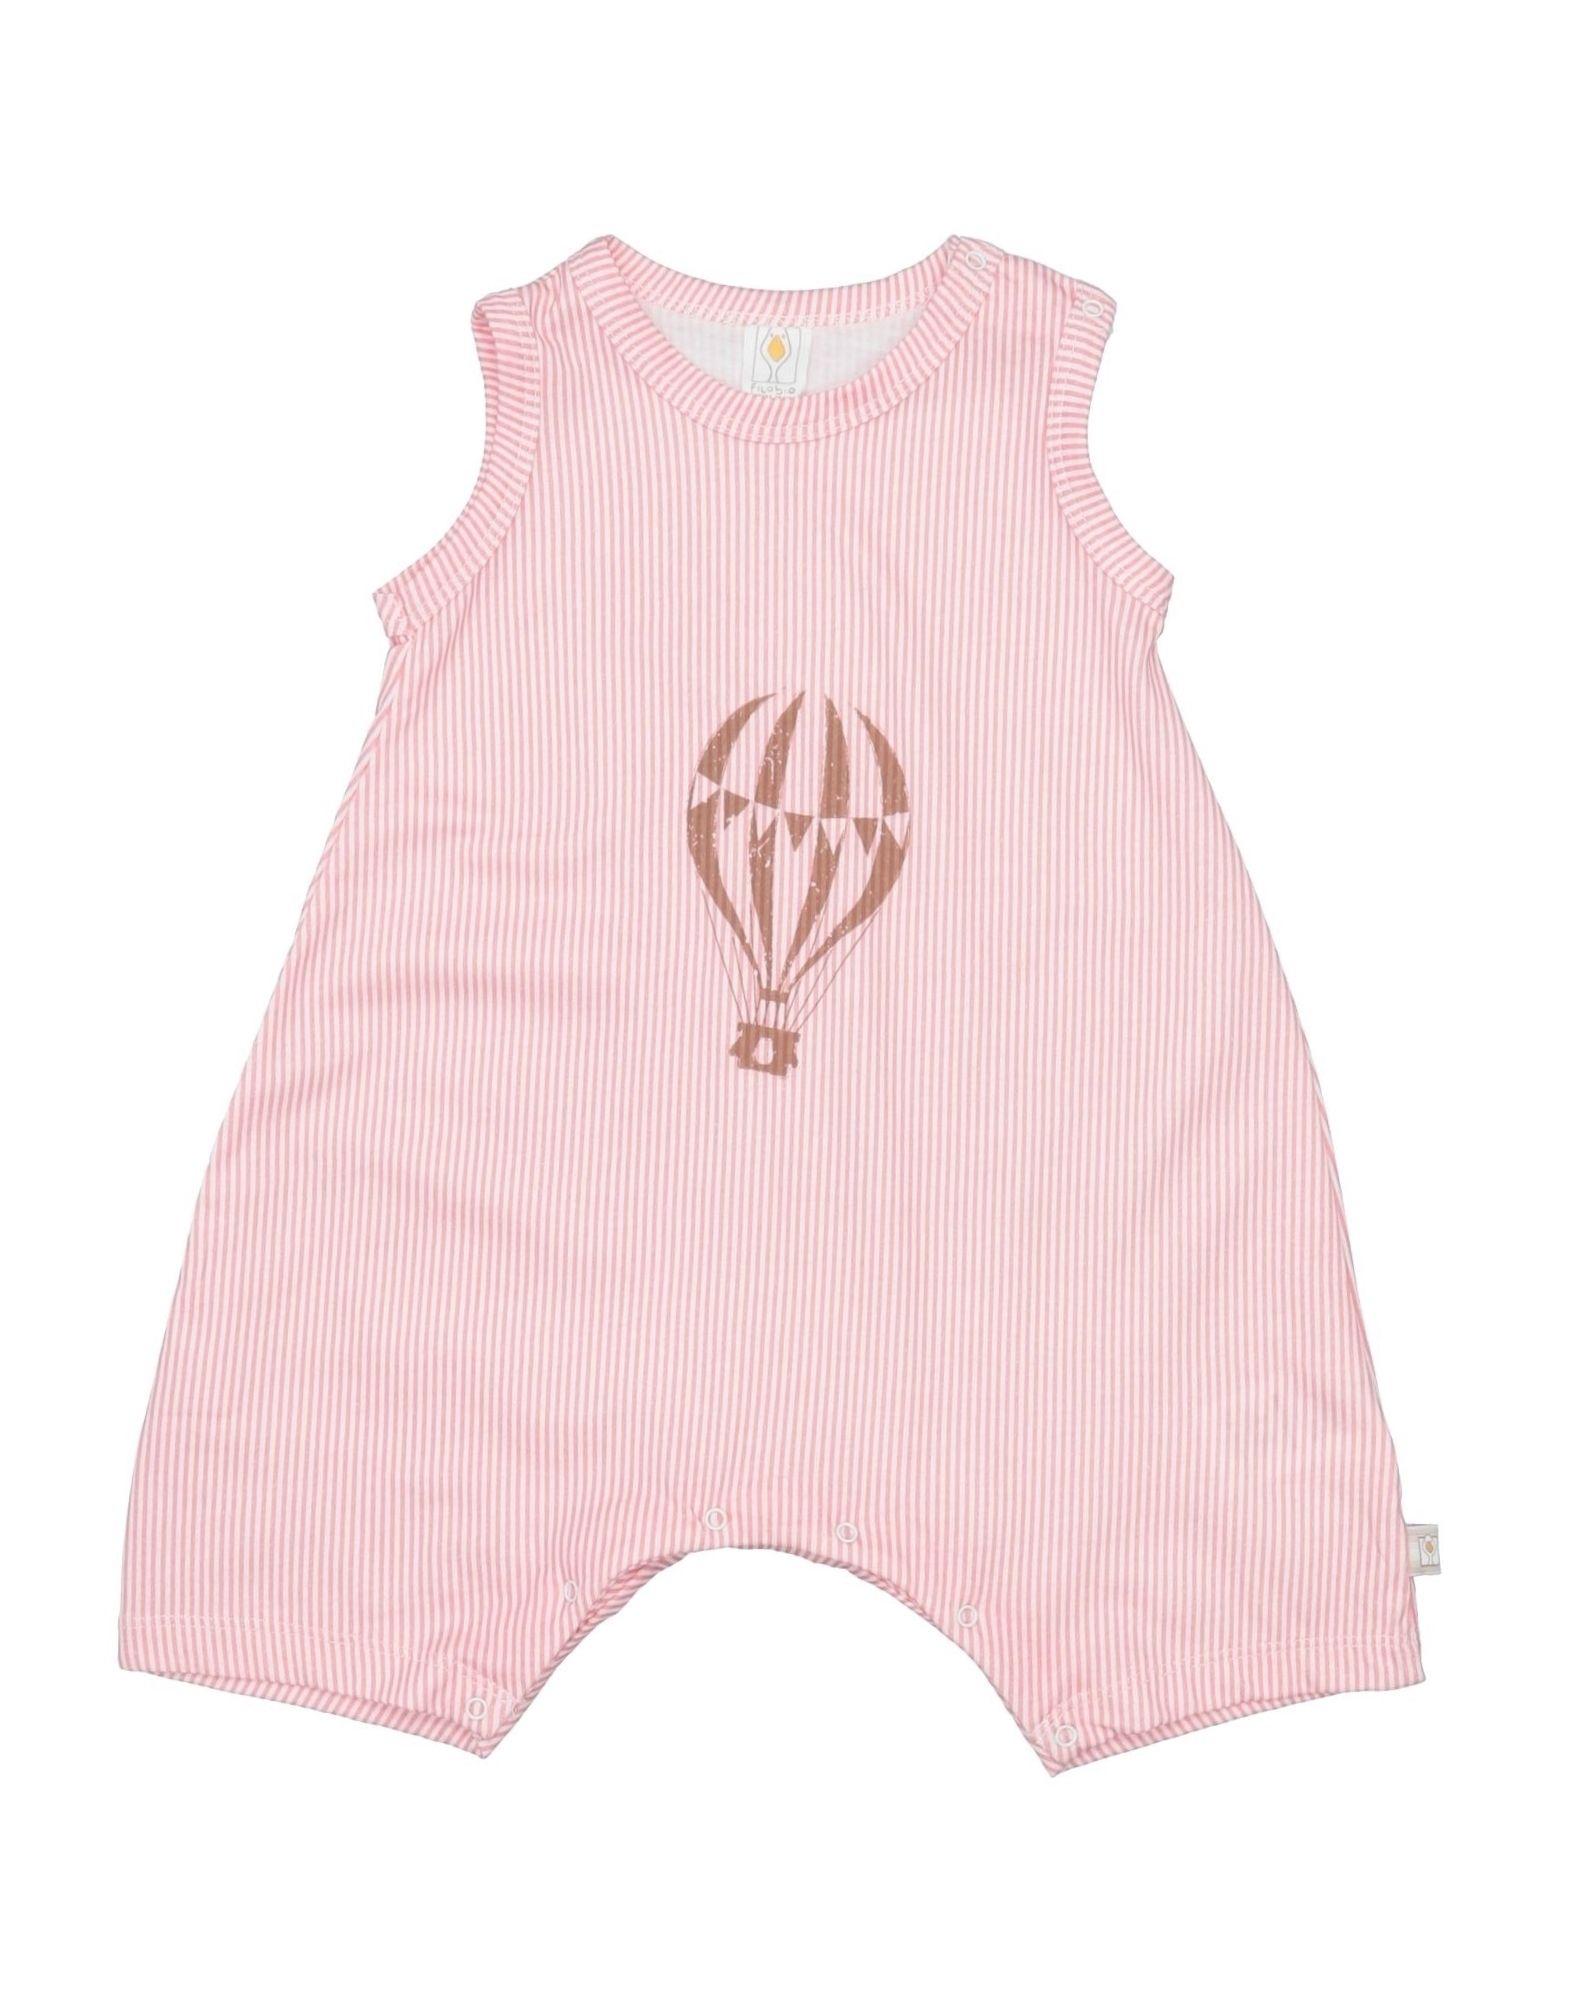 YOOX.COM(ユークス)《セール開催中》FILOBIO ガールズ 0-24 ヶ月 乳幼児用ロンパース コーラル 9 コットン 100%